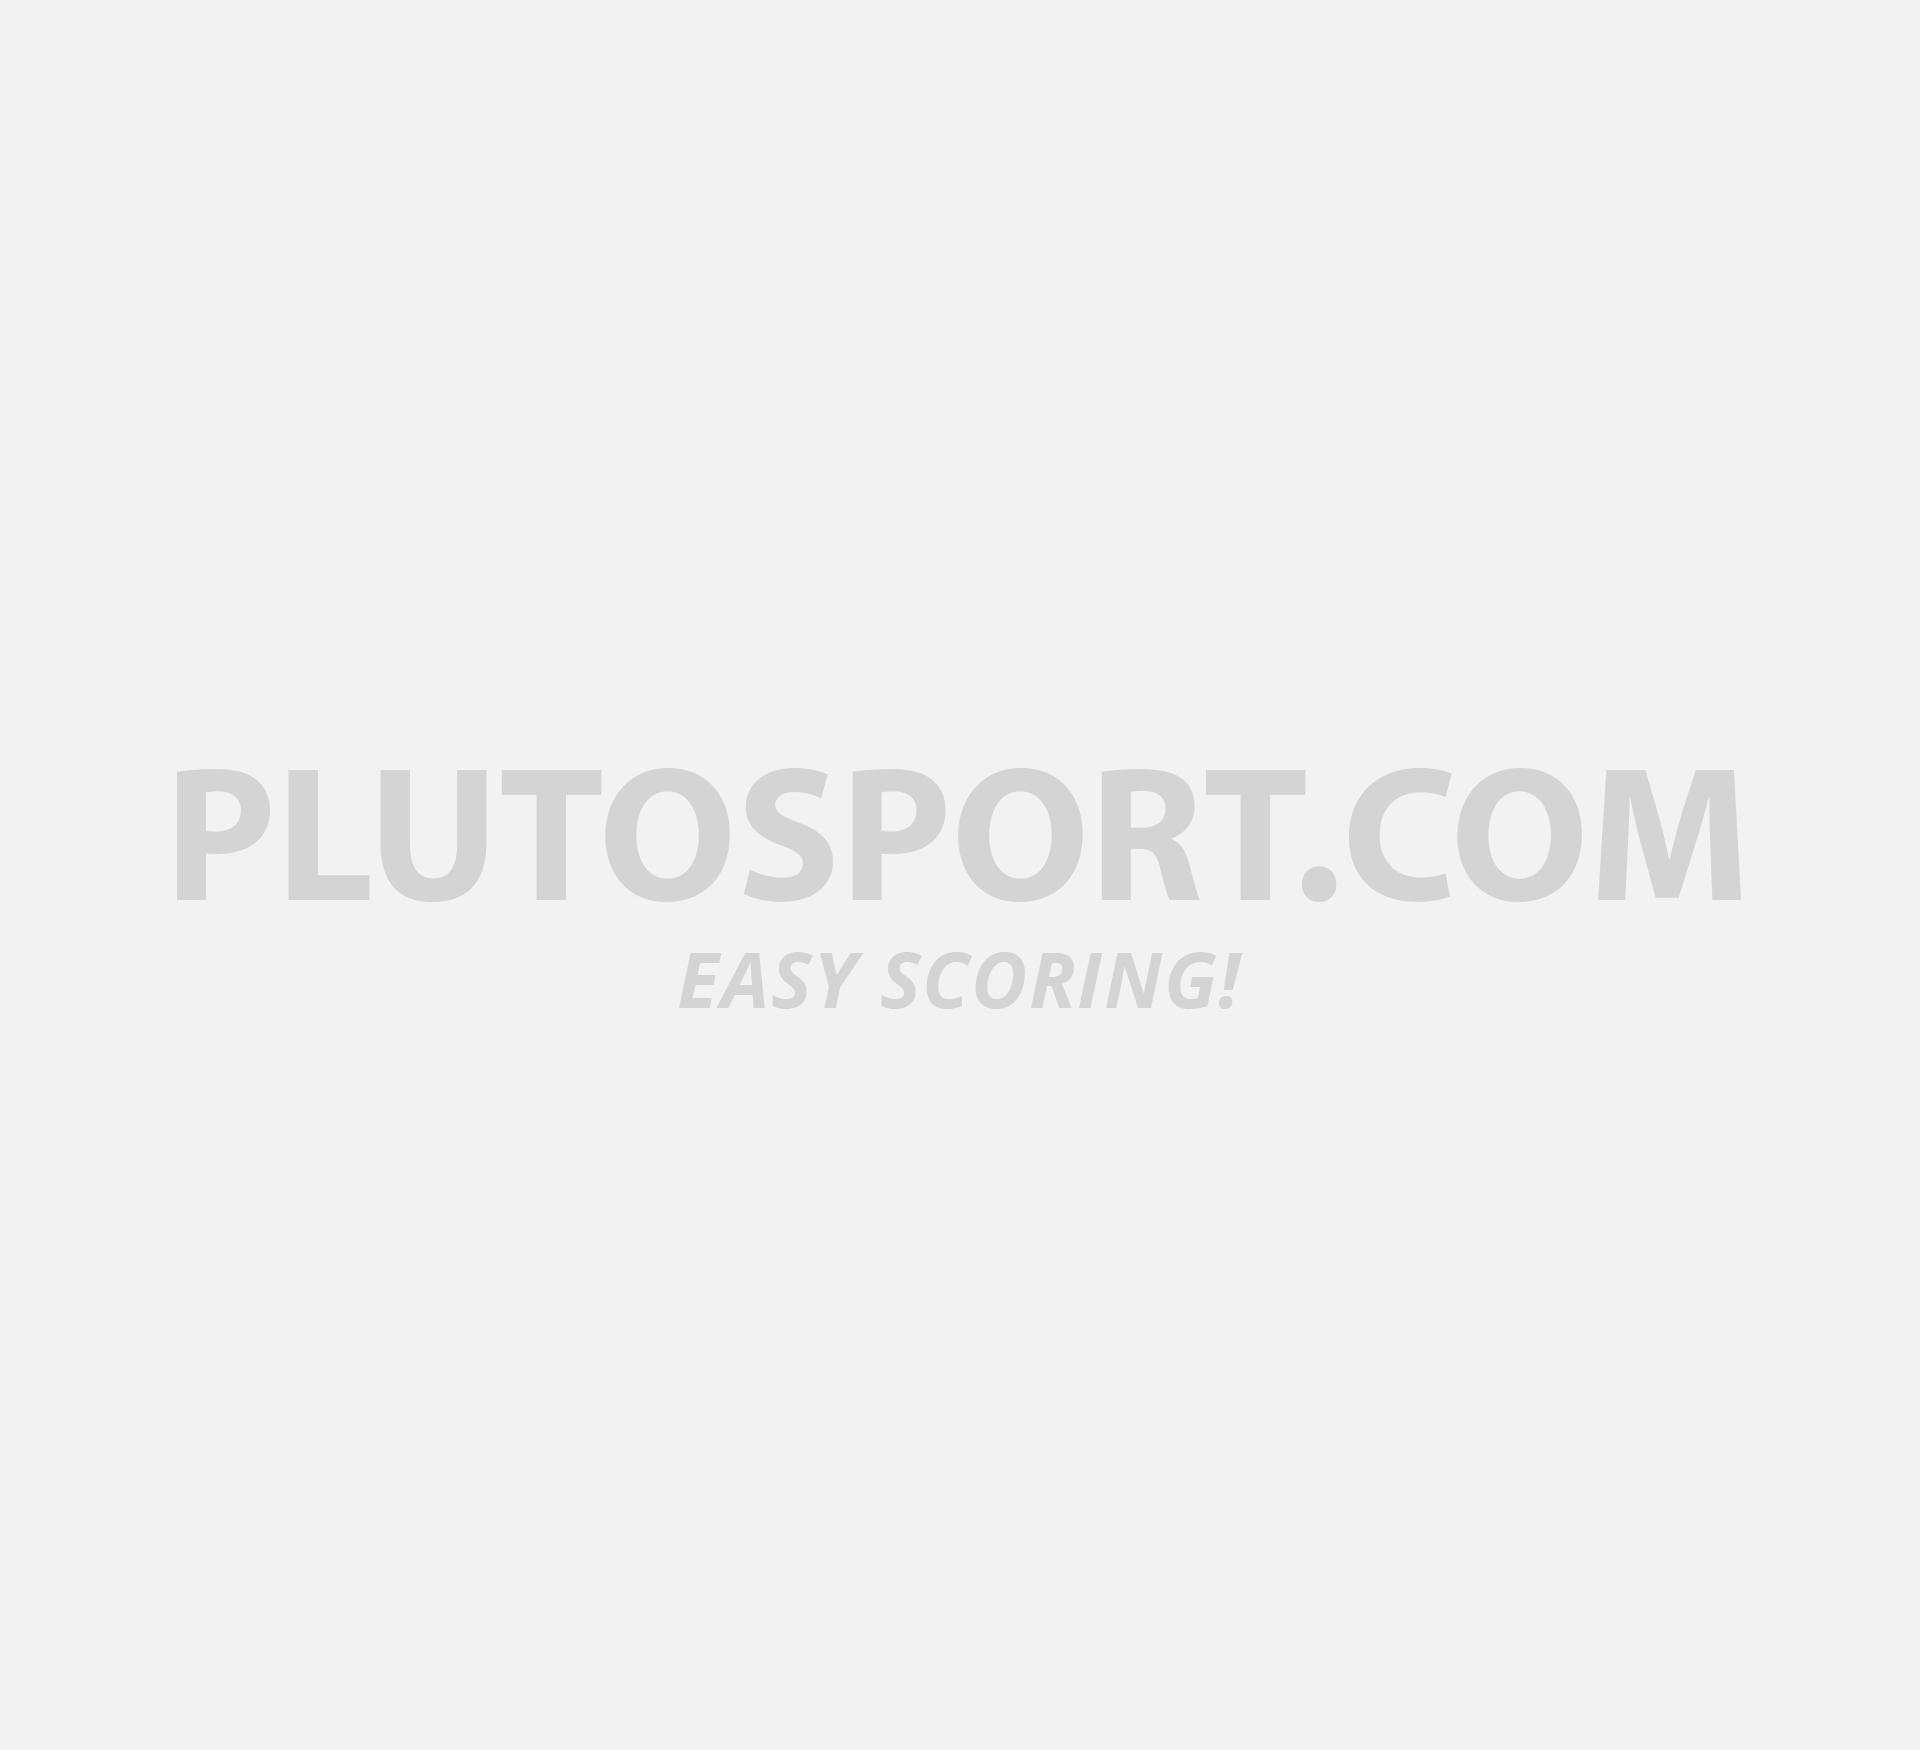 Dunlop Fort Tournament 3* 40+ Tabe Tennis Ball (6-pack)